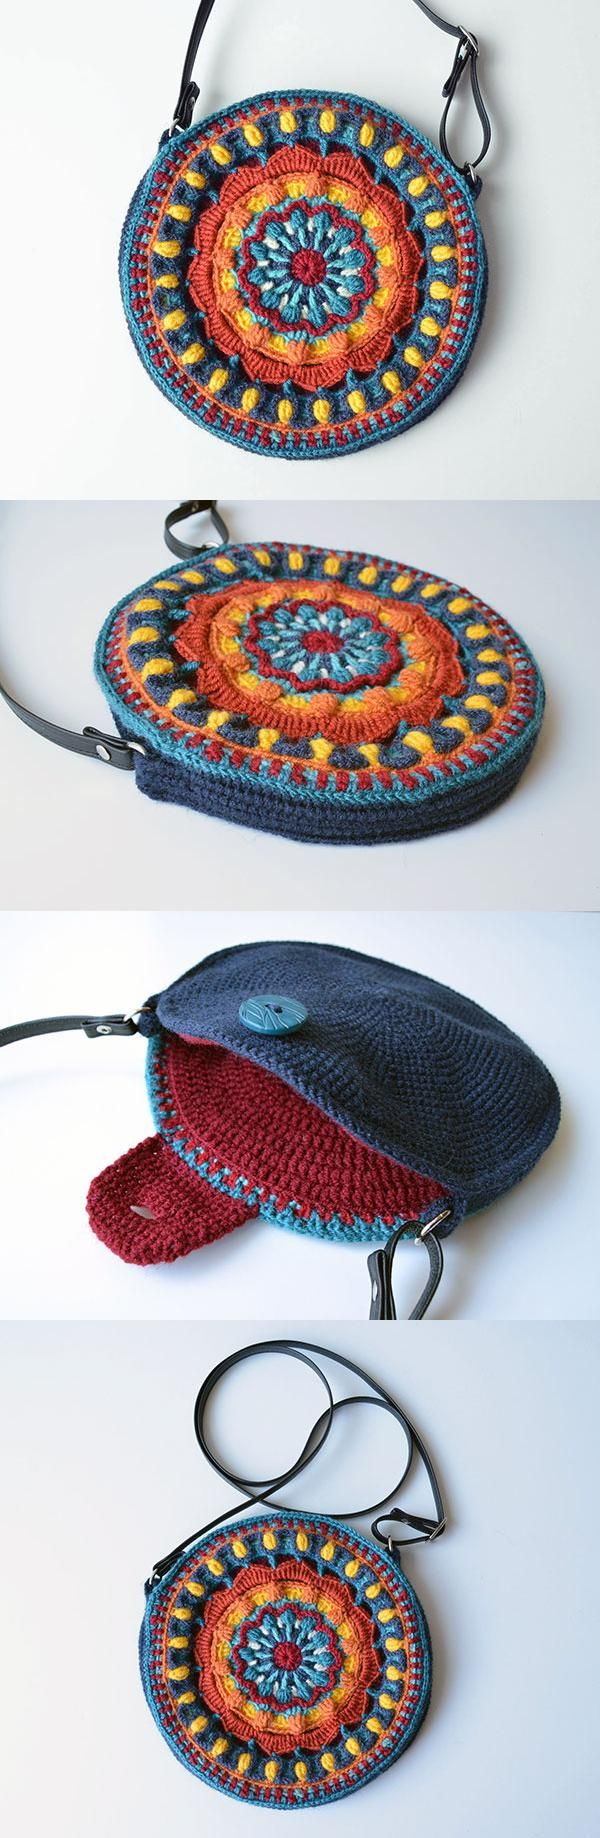 Kaleidoscope Mandala Bag Crochet Pattern ☂ᙓᖇᗴᔕᗩ ᖇᙓᔕ☂ᙓᘐᘎᓮ http://www.pinterest.com/teretegui